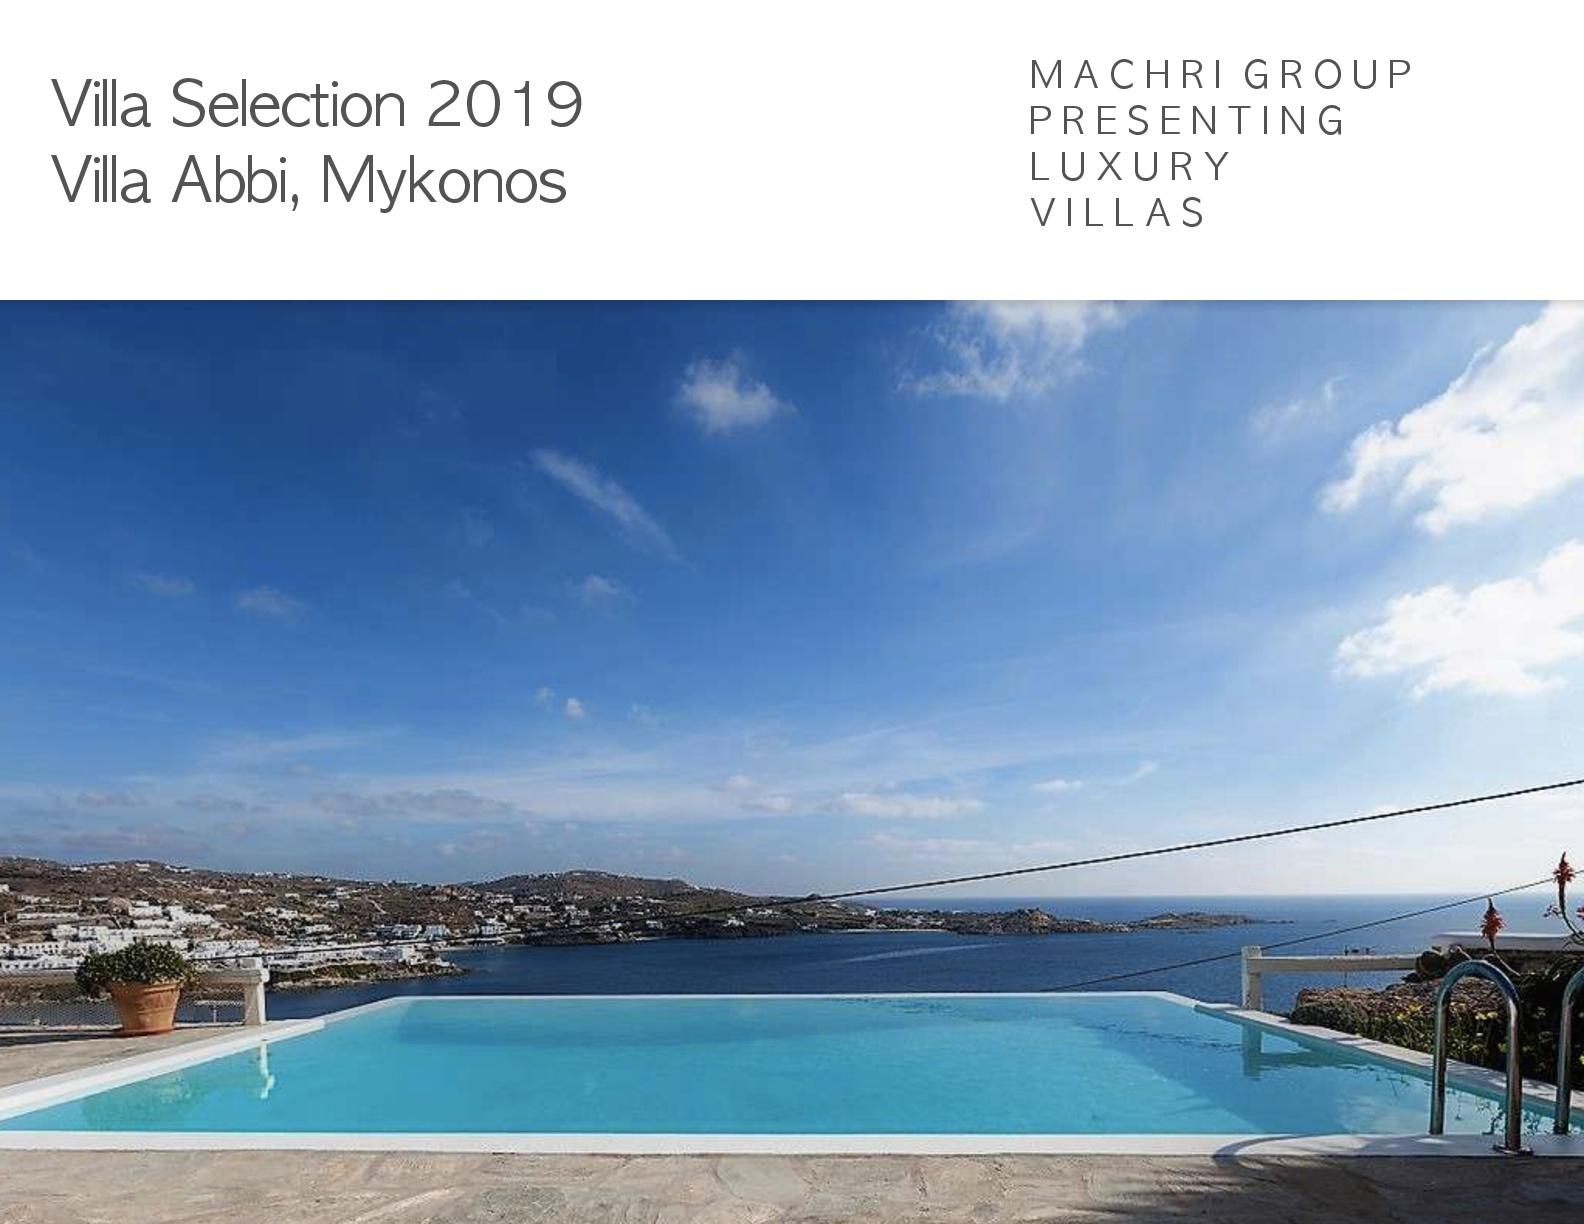 Villa-Abbi,-Mykonos-ilovepdf-compressed-001